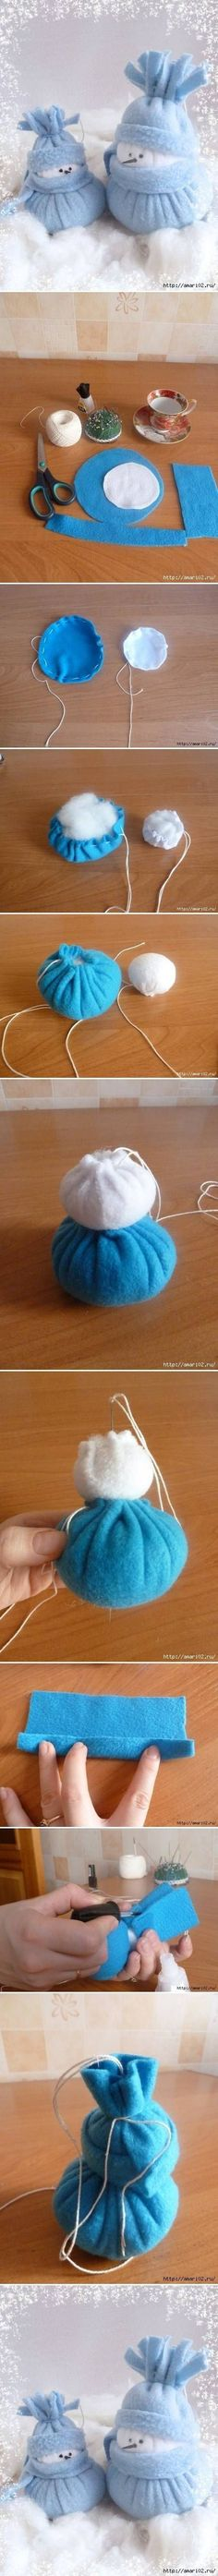 DIY Felt Snowman DIY Felt Snowman by diyforever